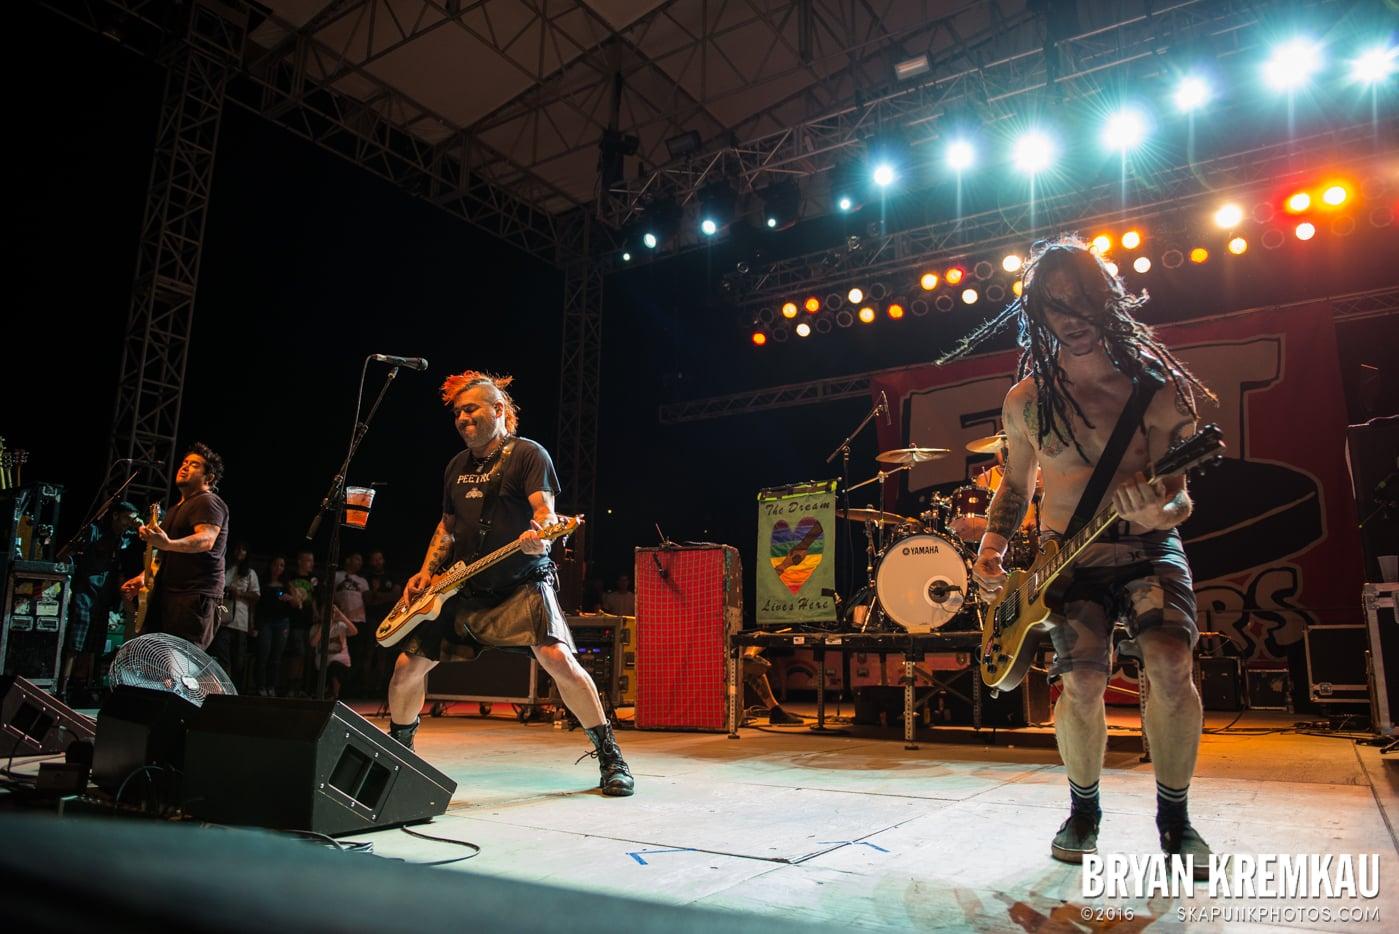 NOFX @ Stone Pony Summer Stage, Asbury Park, NJ - 8.15.15 (4)